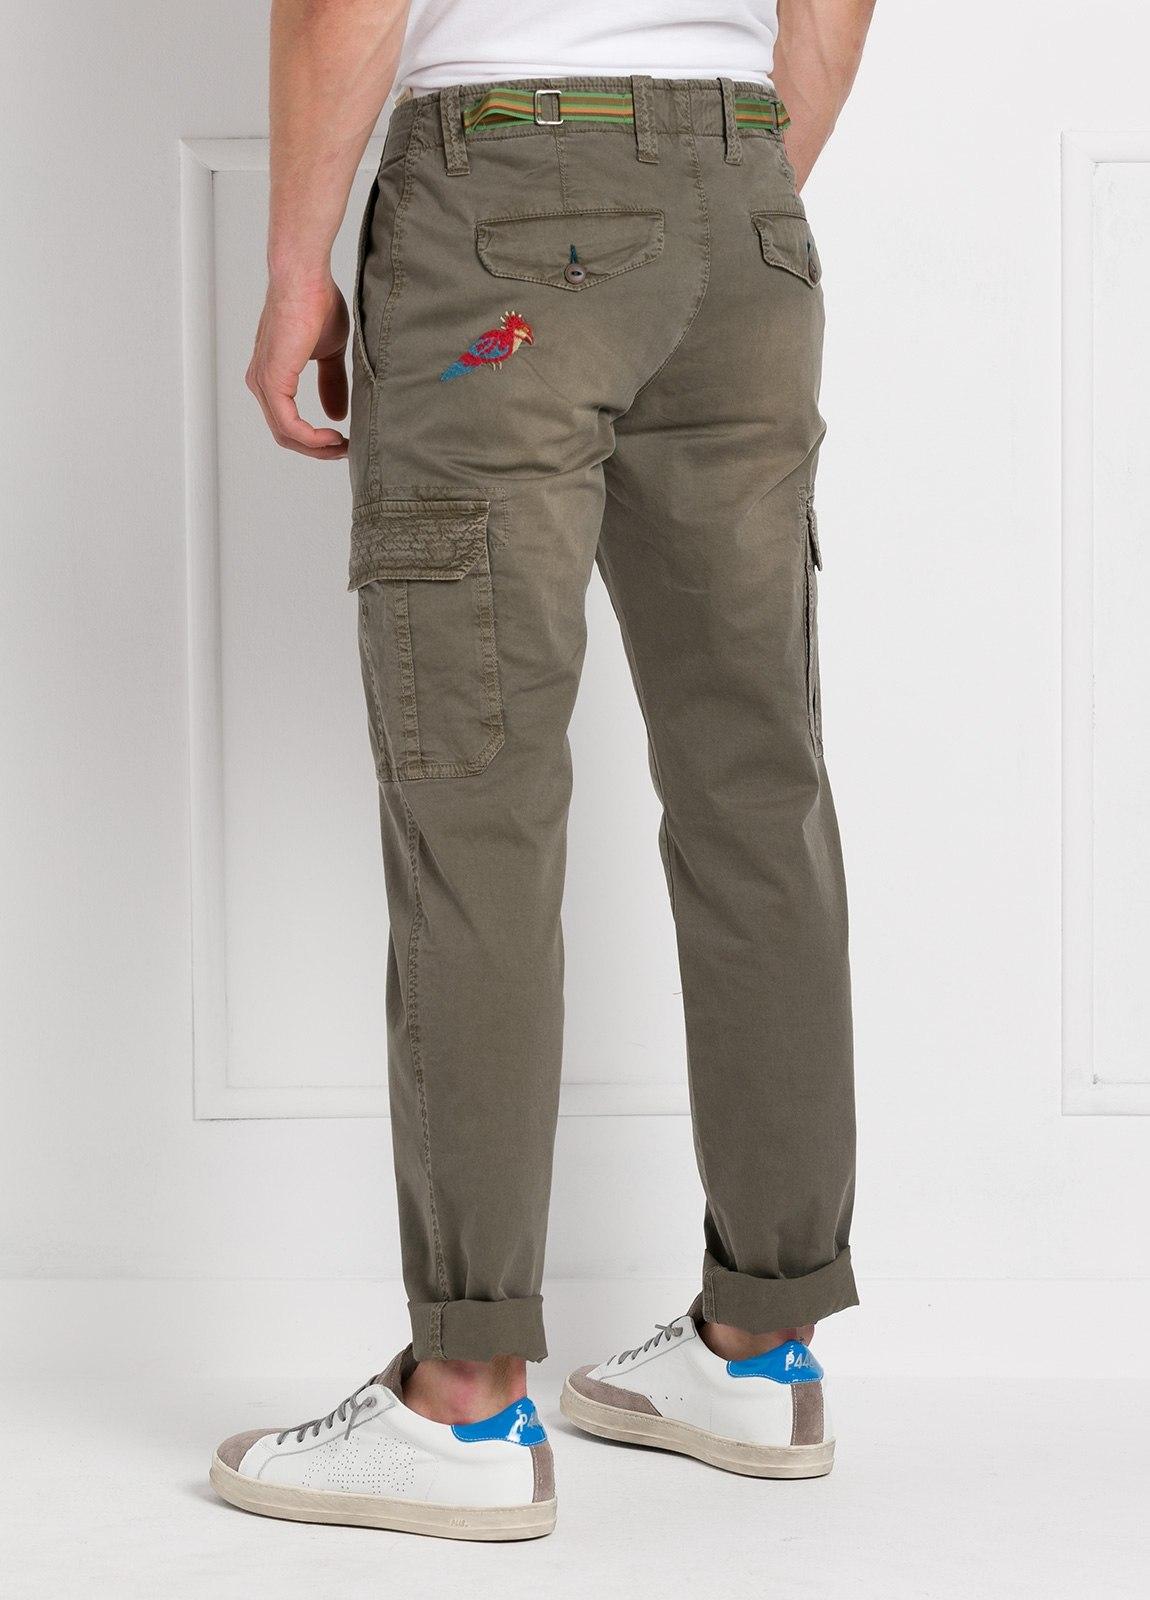 Pantalón sport modelo OLIVER color kaki con bolsillos laterales. Algodón gabardina vintage. - Ítem1